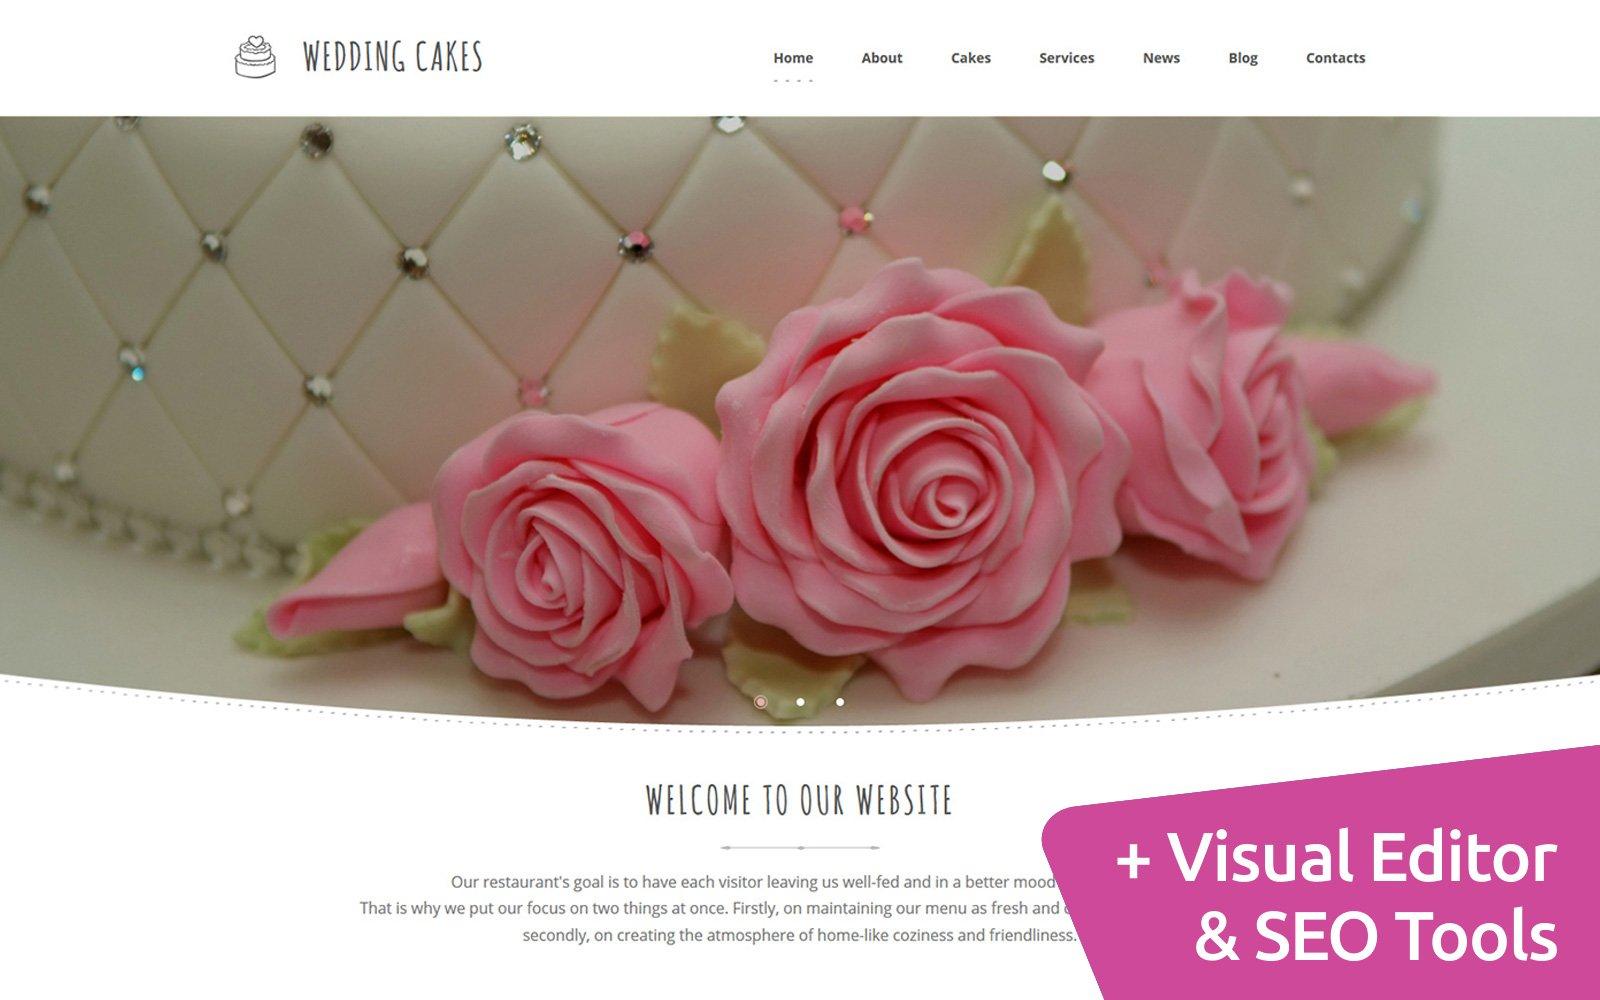 Wedding Cakes Templates Moto CMS 3 №59138